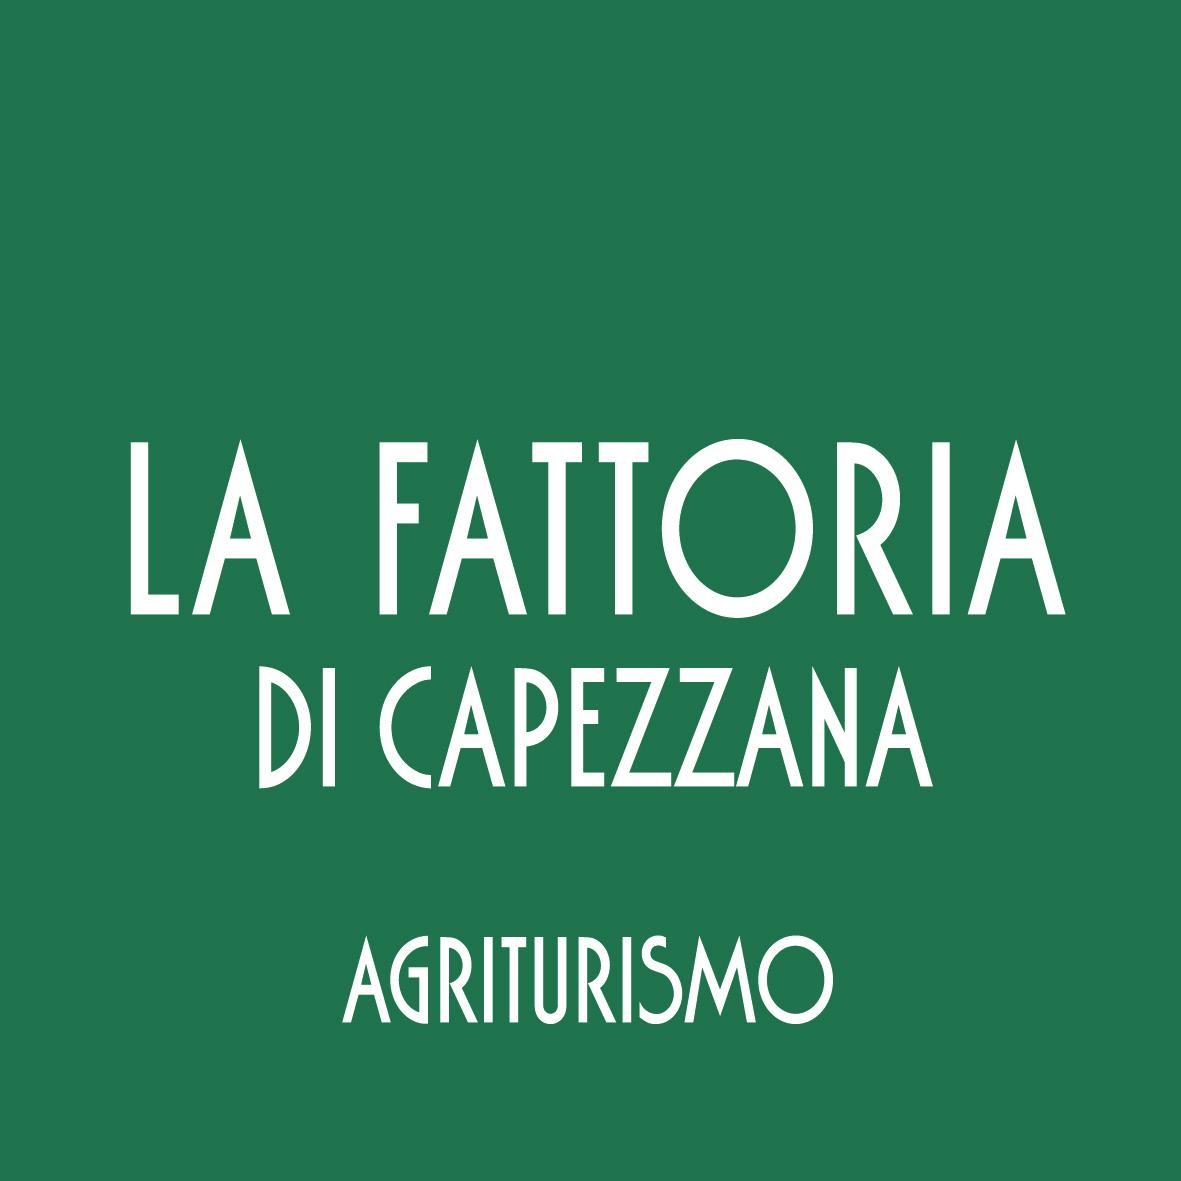 LAFATTORIA_LOGO.jpg